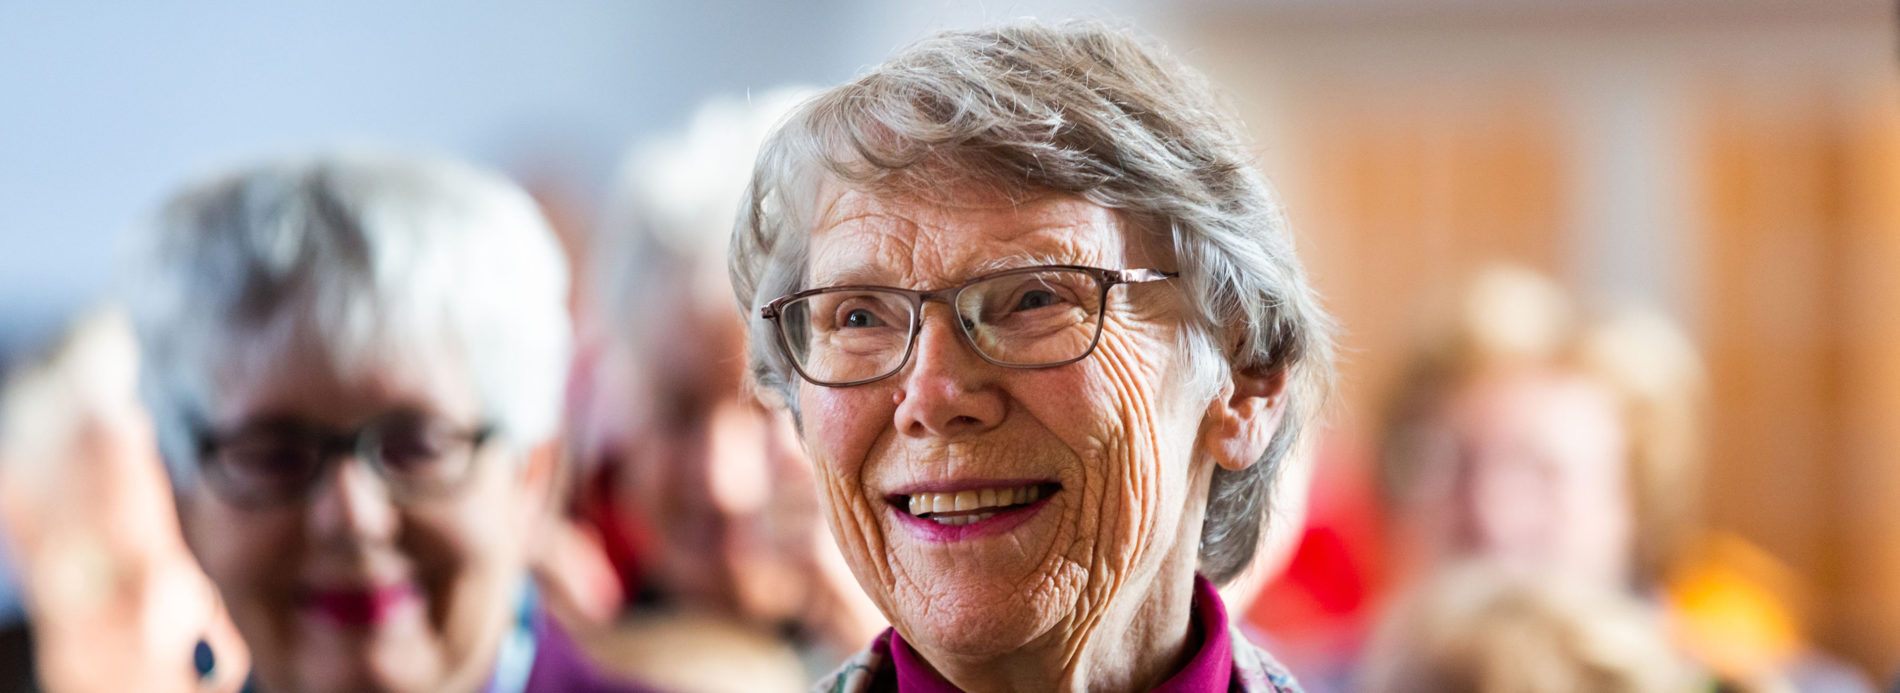 An elderly woman smiles in worship